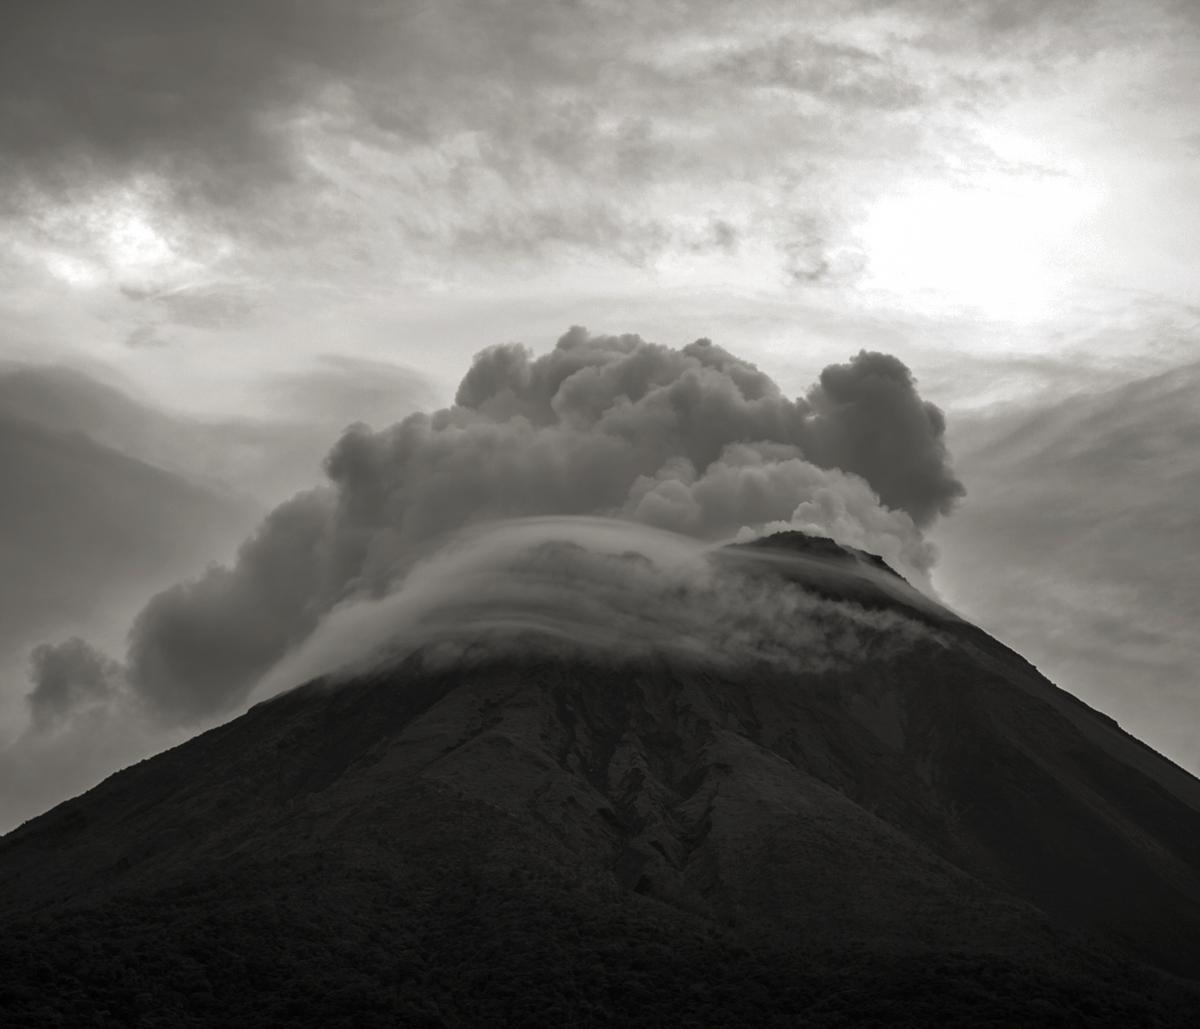 Volcan Arenal © Stéphane Louis, VIII. 07